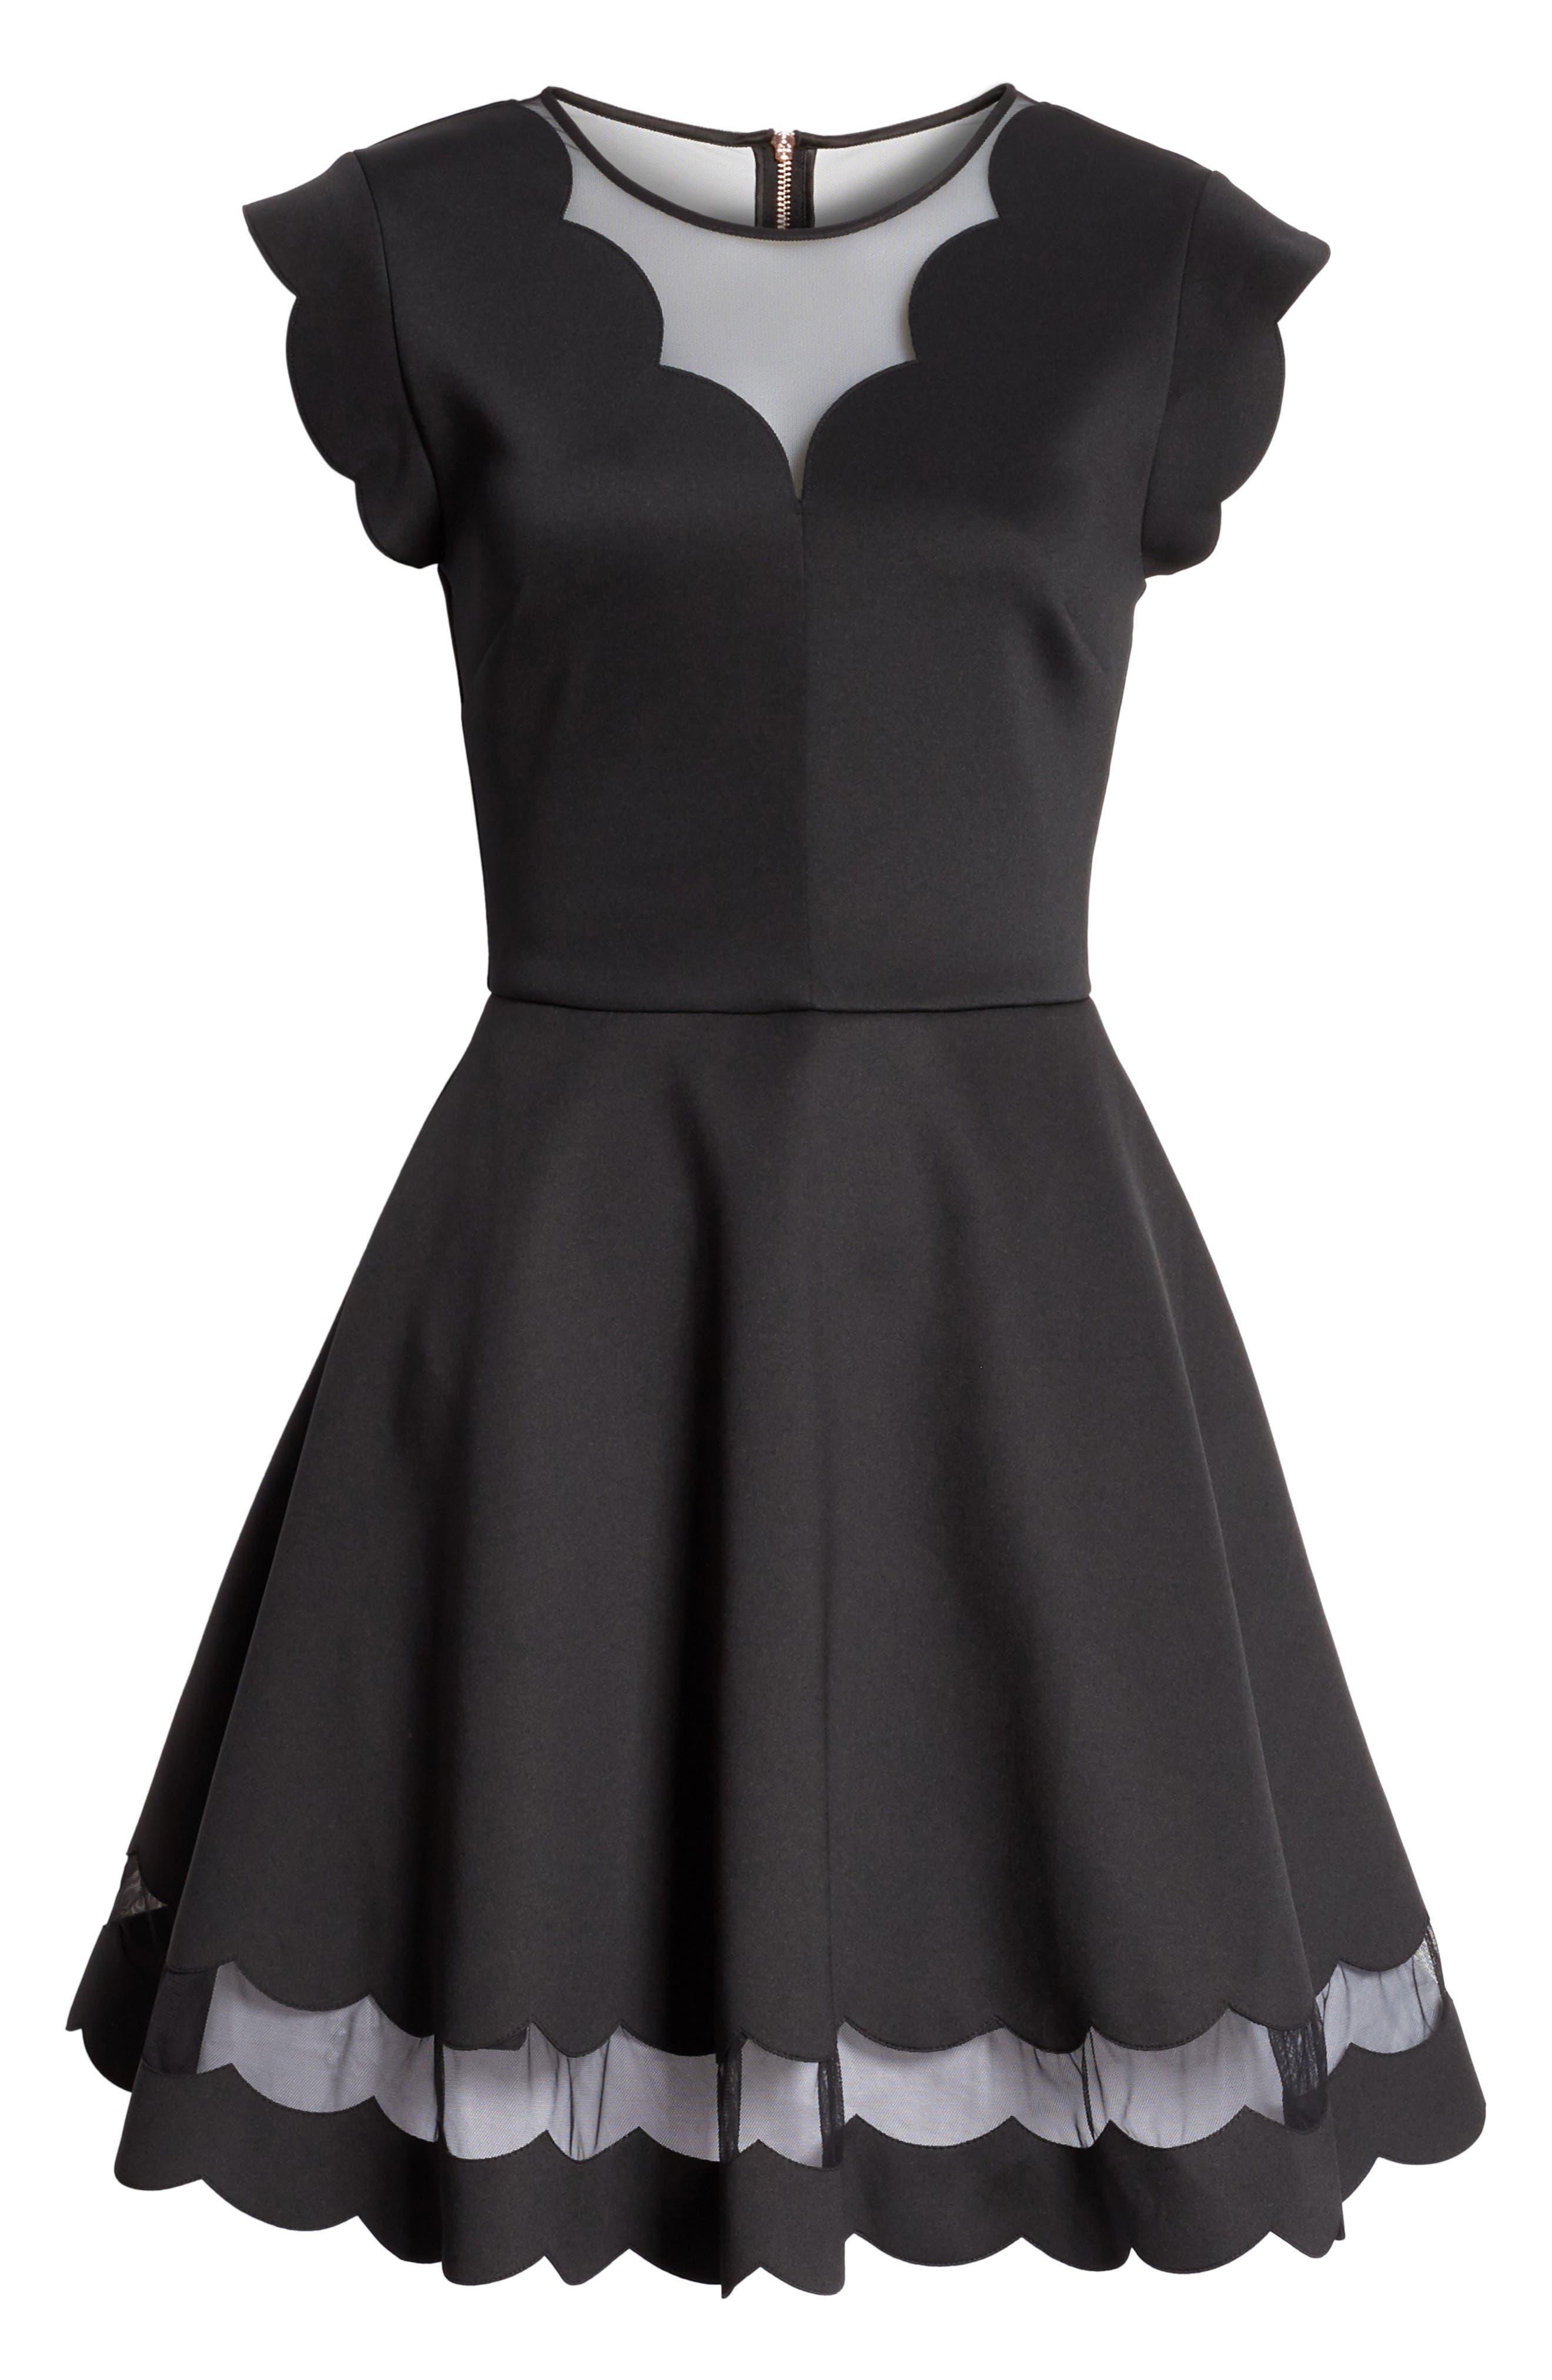 Mesh Panel Scallop Skater Dress,                             Alternate thumbnail 6, color,                             Black